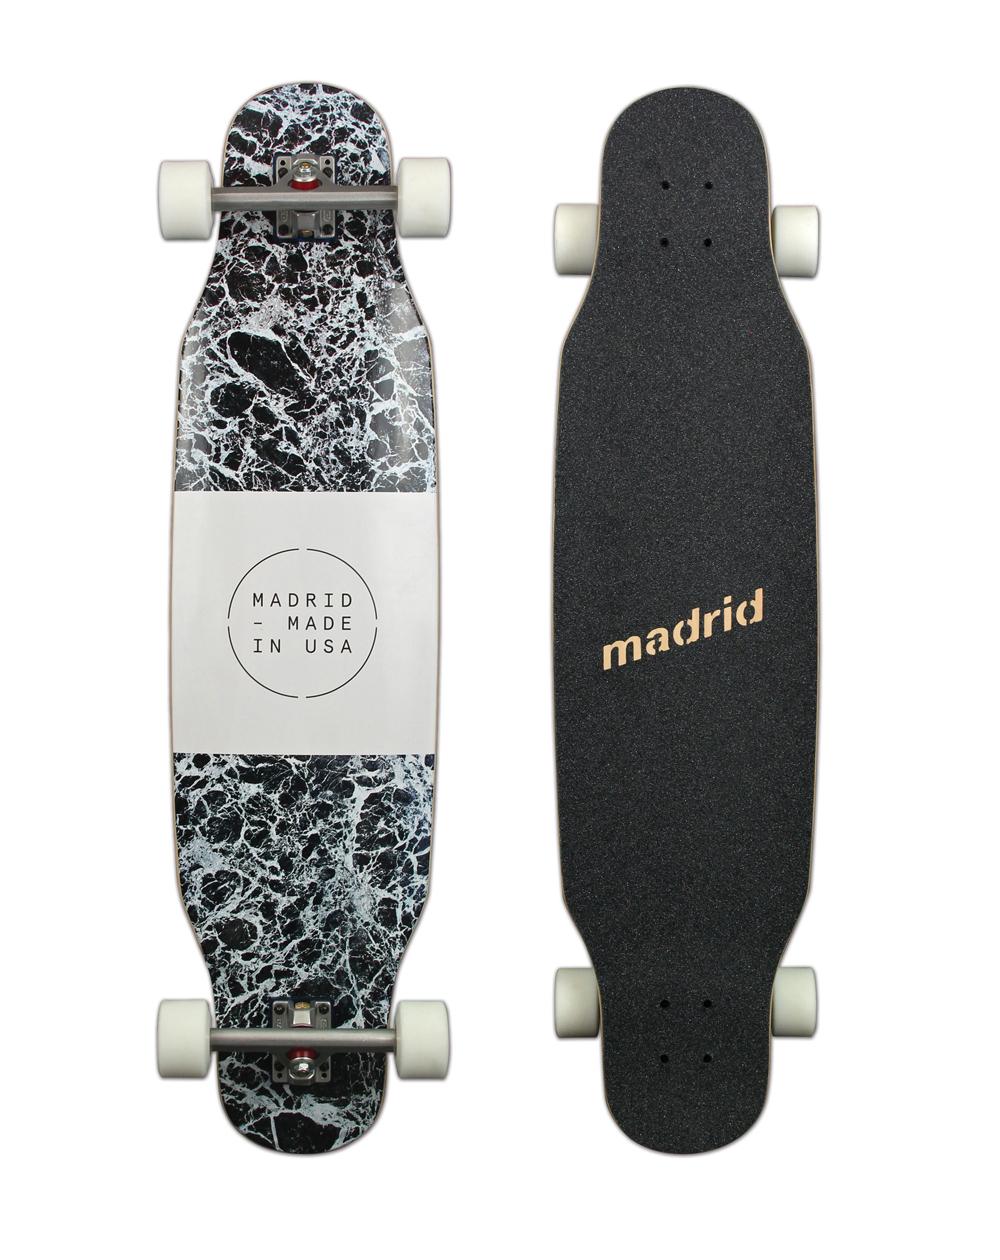 Madrid Longboard Split Maxed